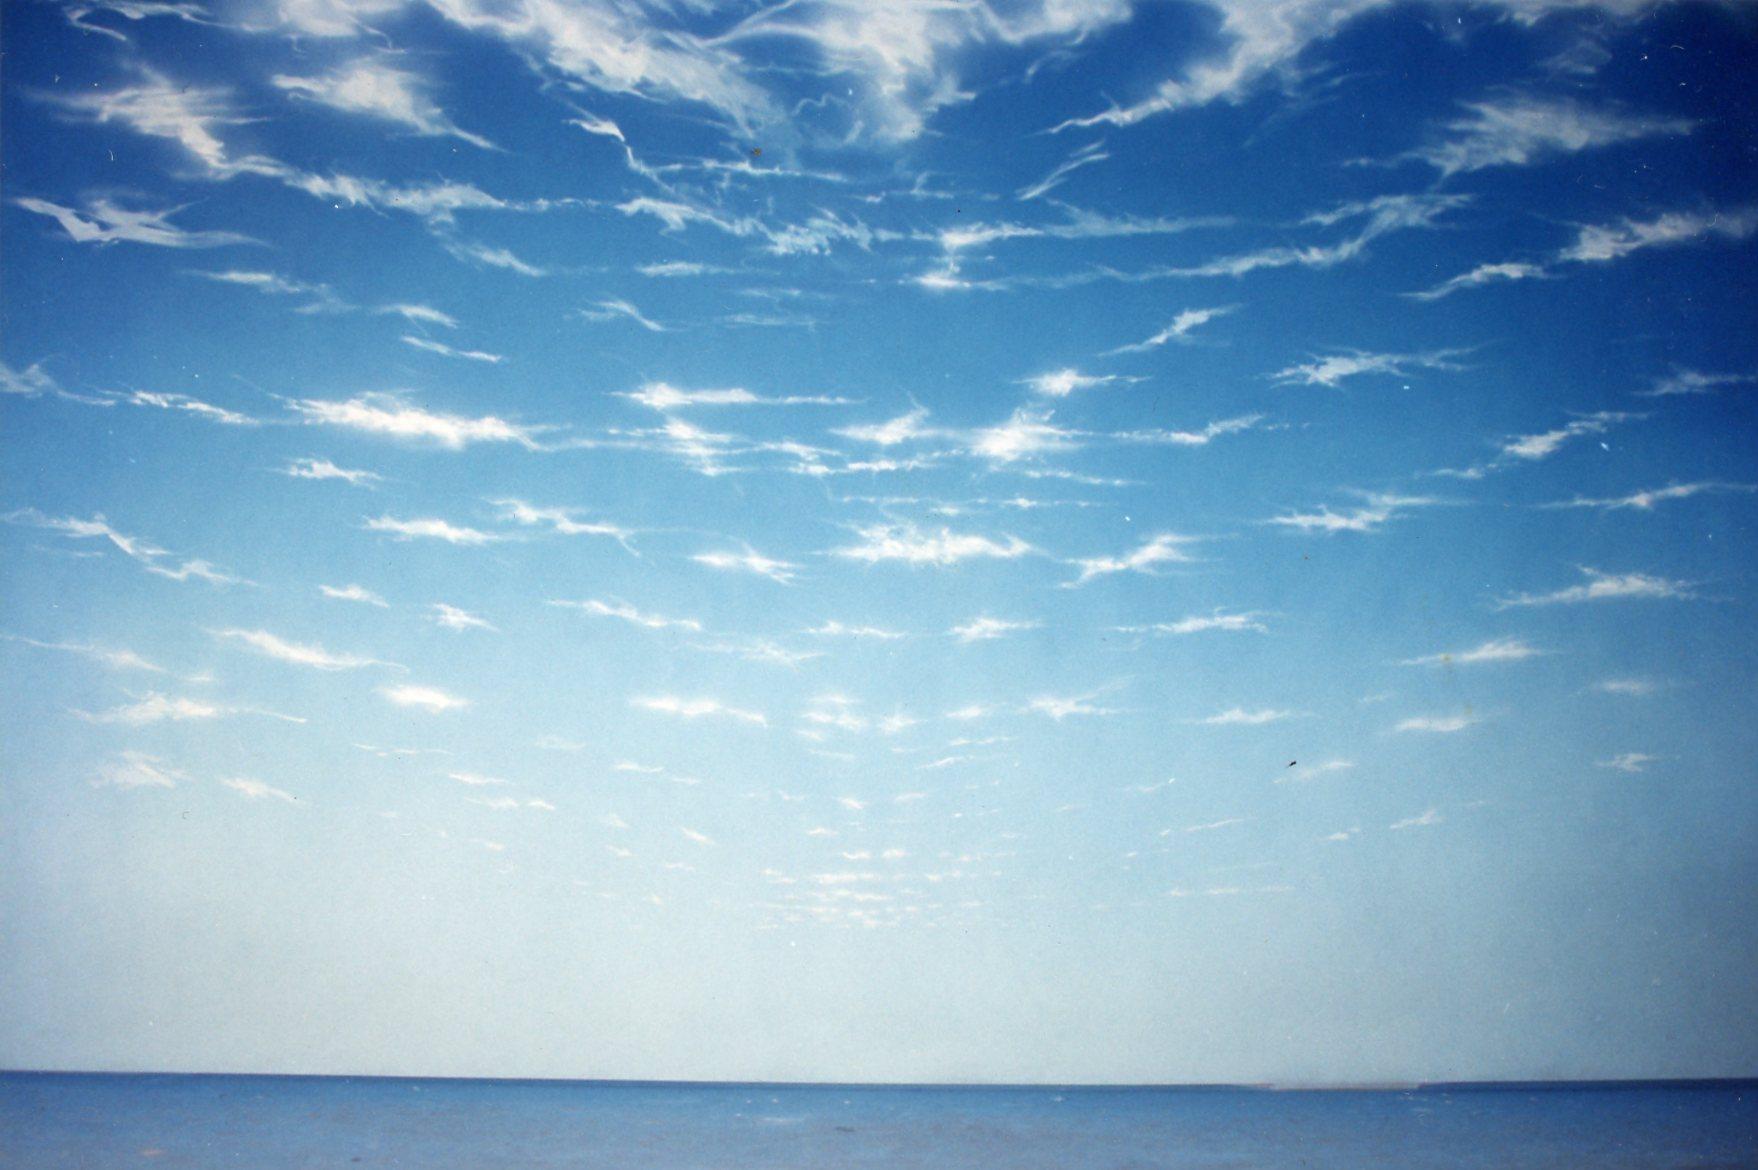 sky backdrop